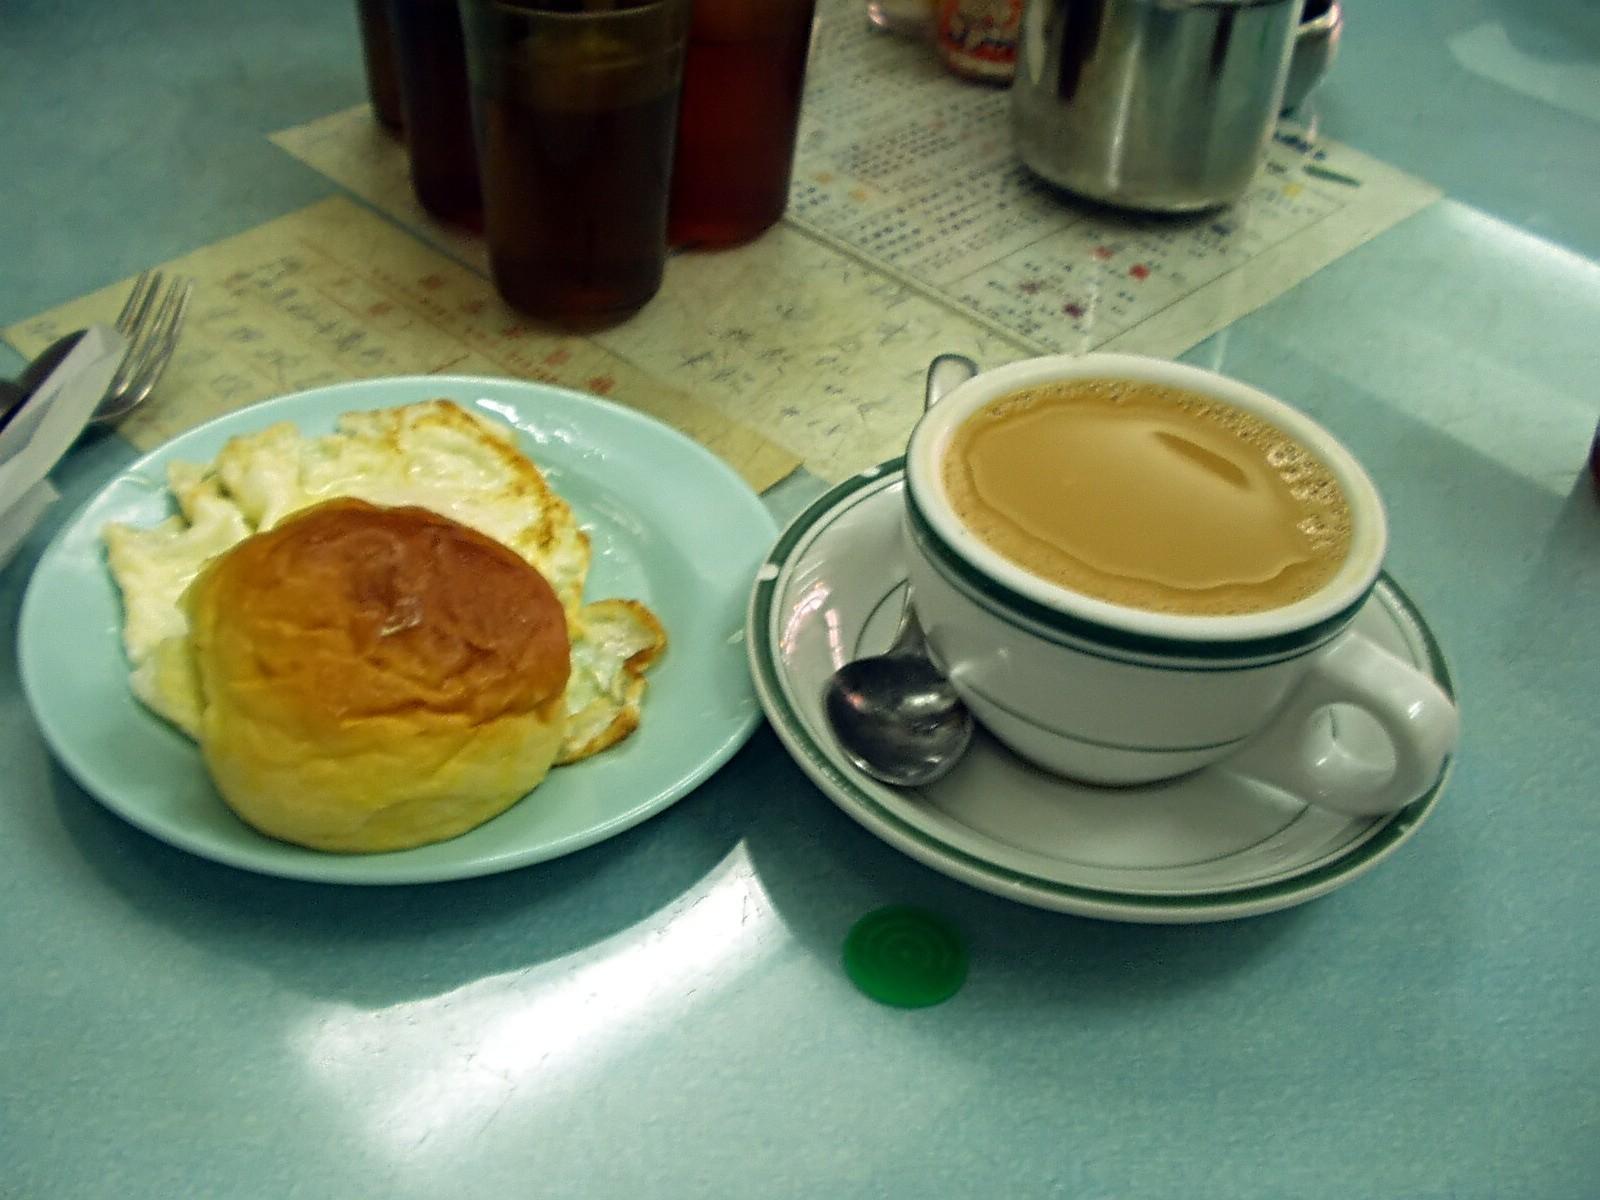 typical_breakfast_of_cha_chaan_teng_with_hong_kong_style_milk_tea.JPG